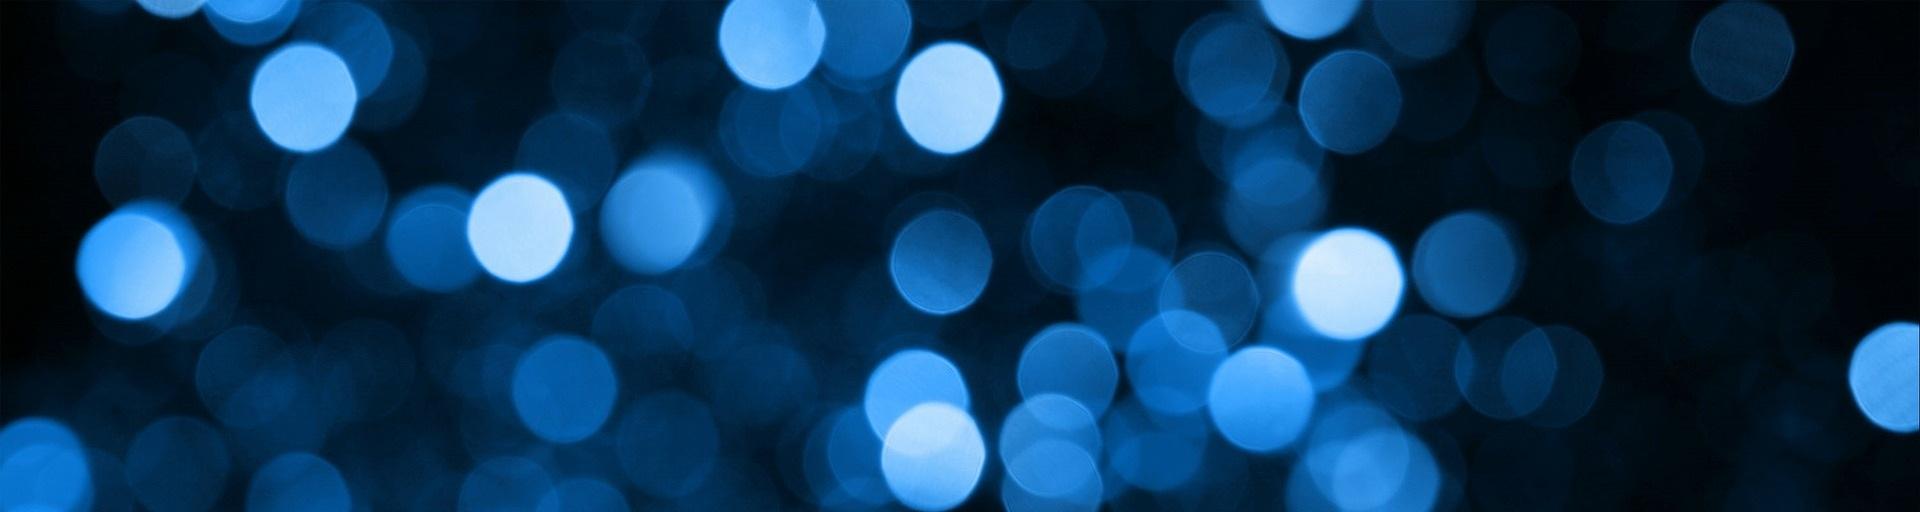 blue-313995_1920.jpg